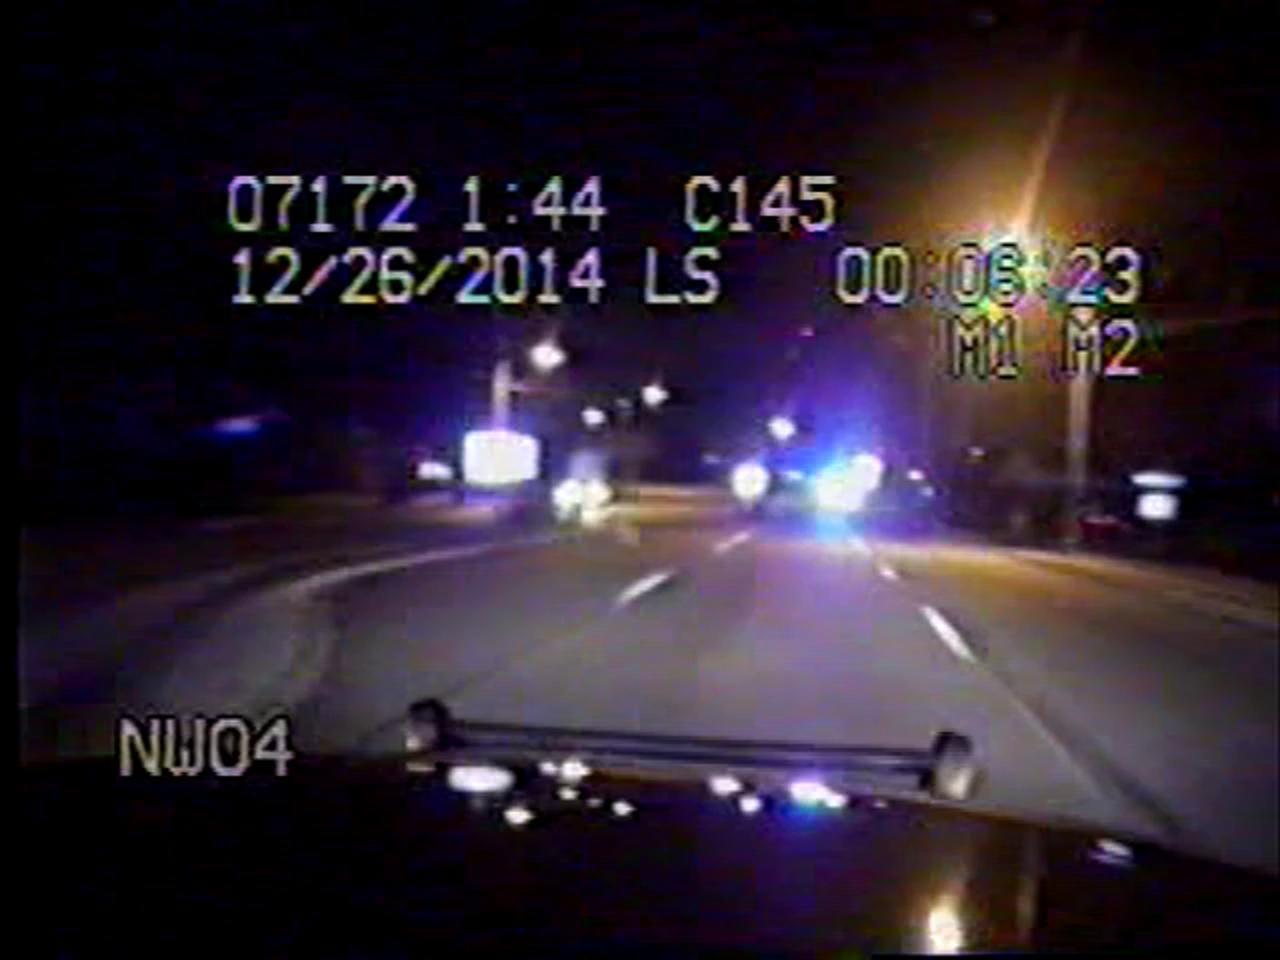 Raw video: December SC Highway Patrol chase dashcam video